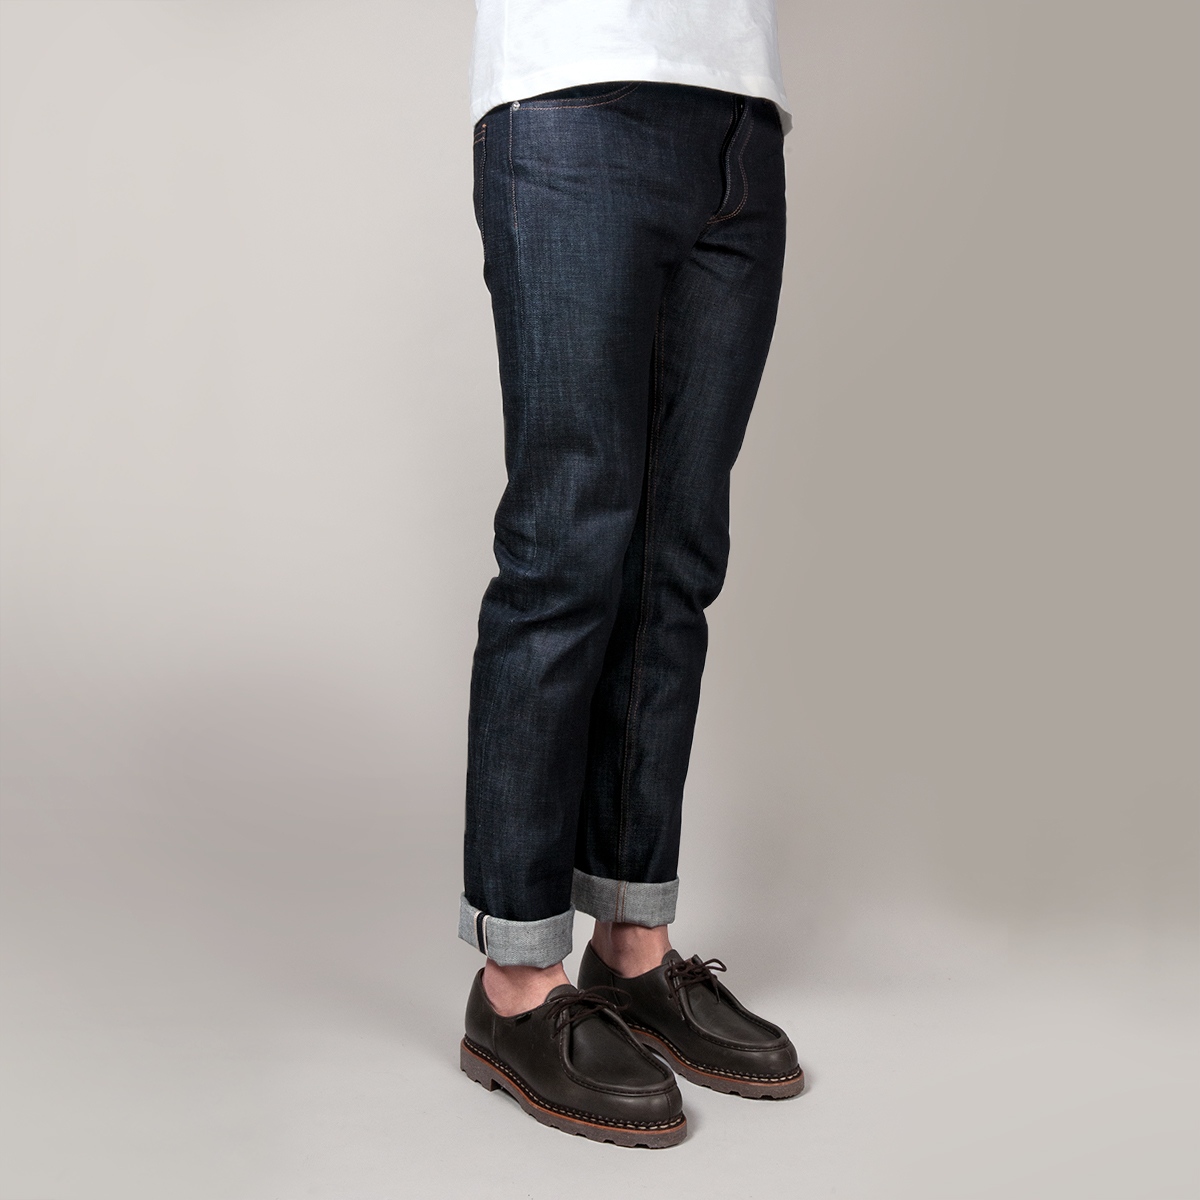 Jeans madeinfrance ajuste cote